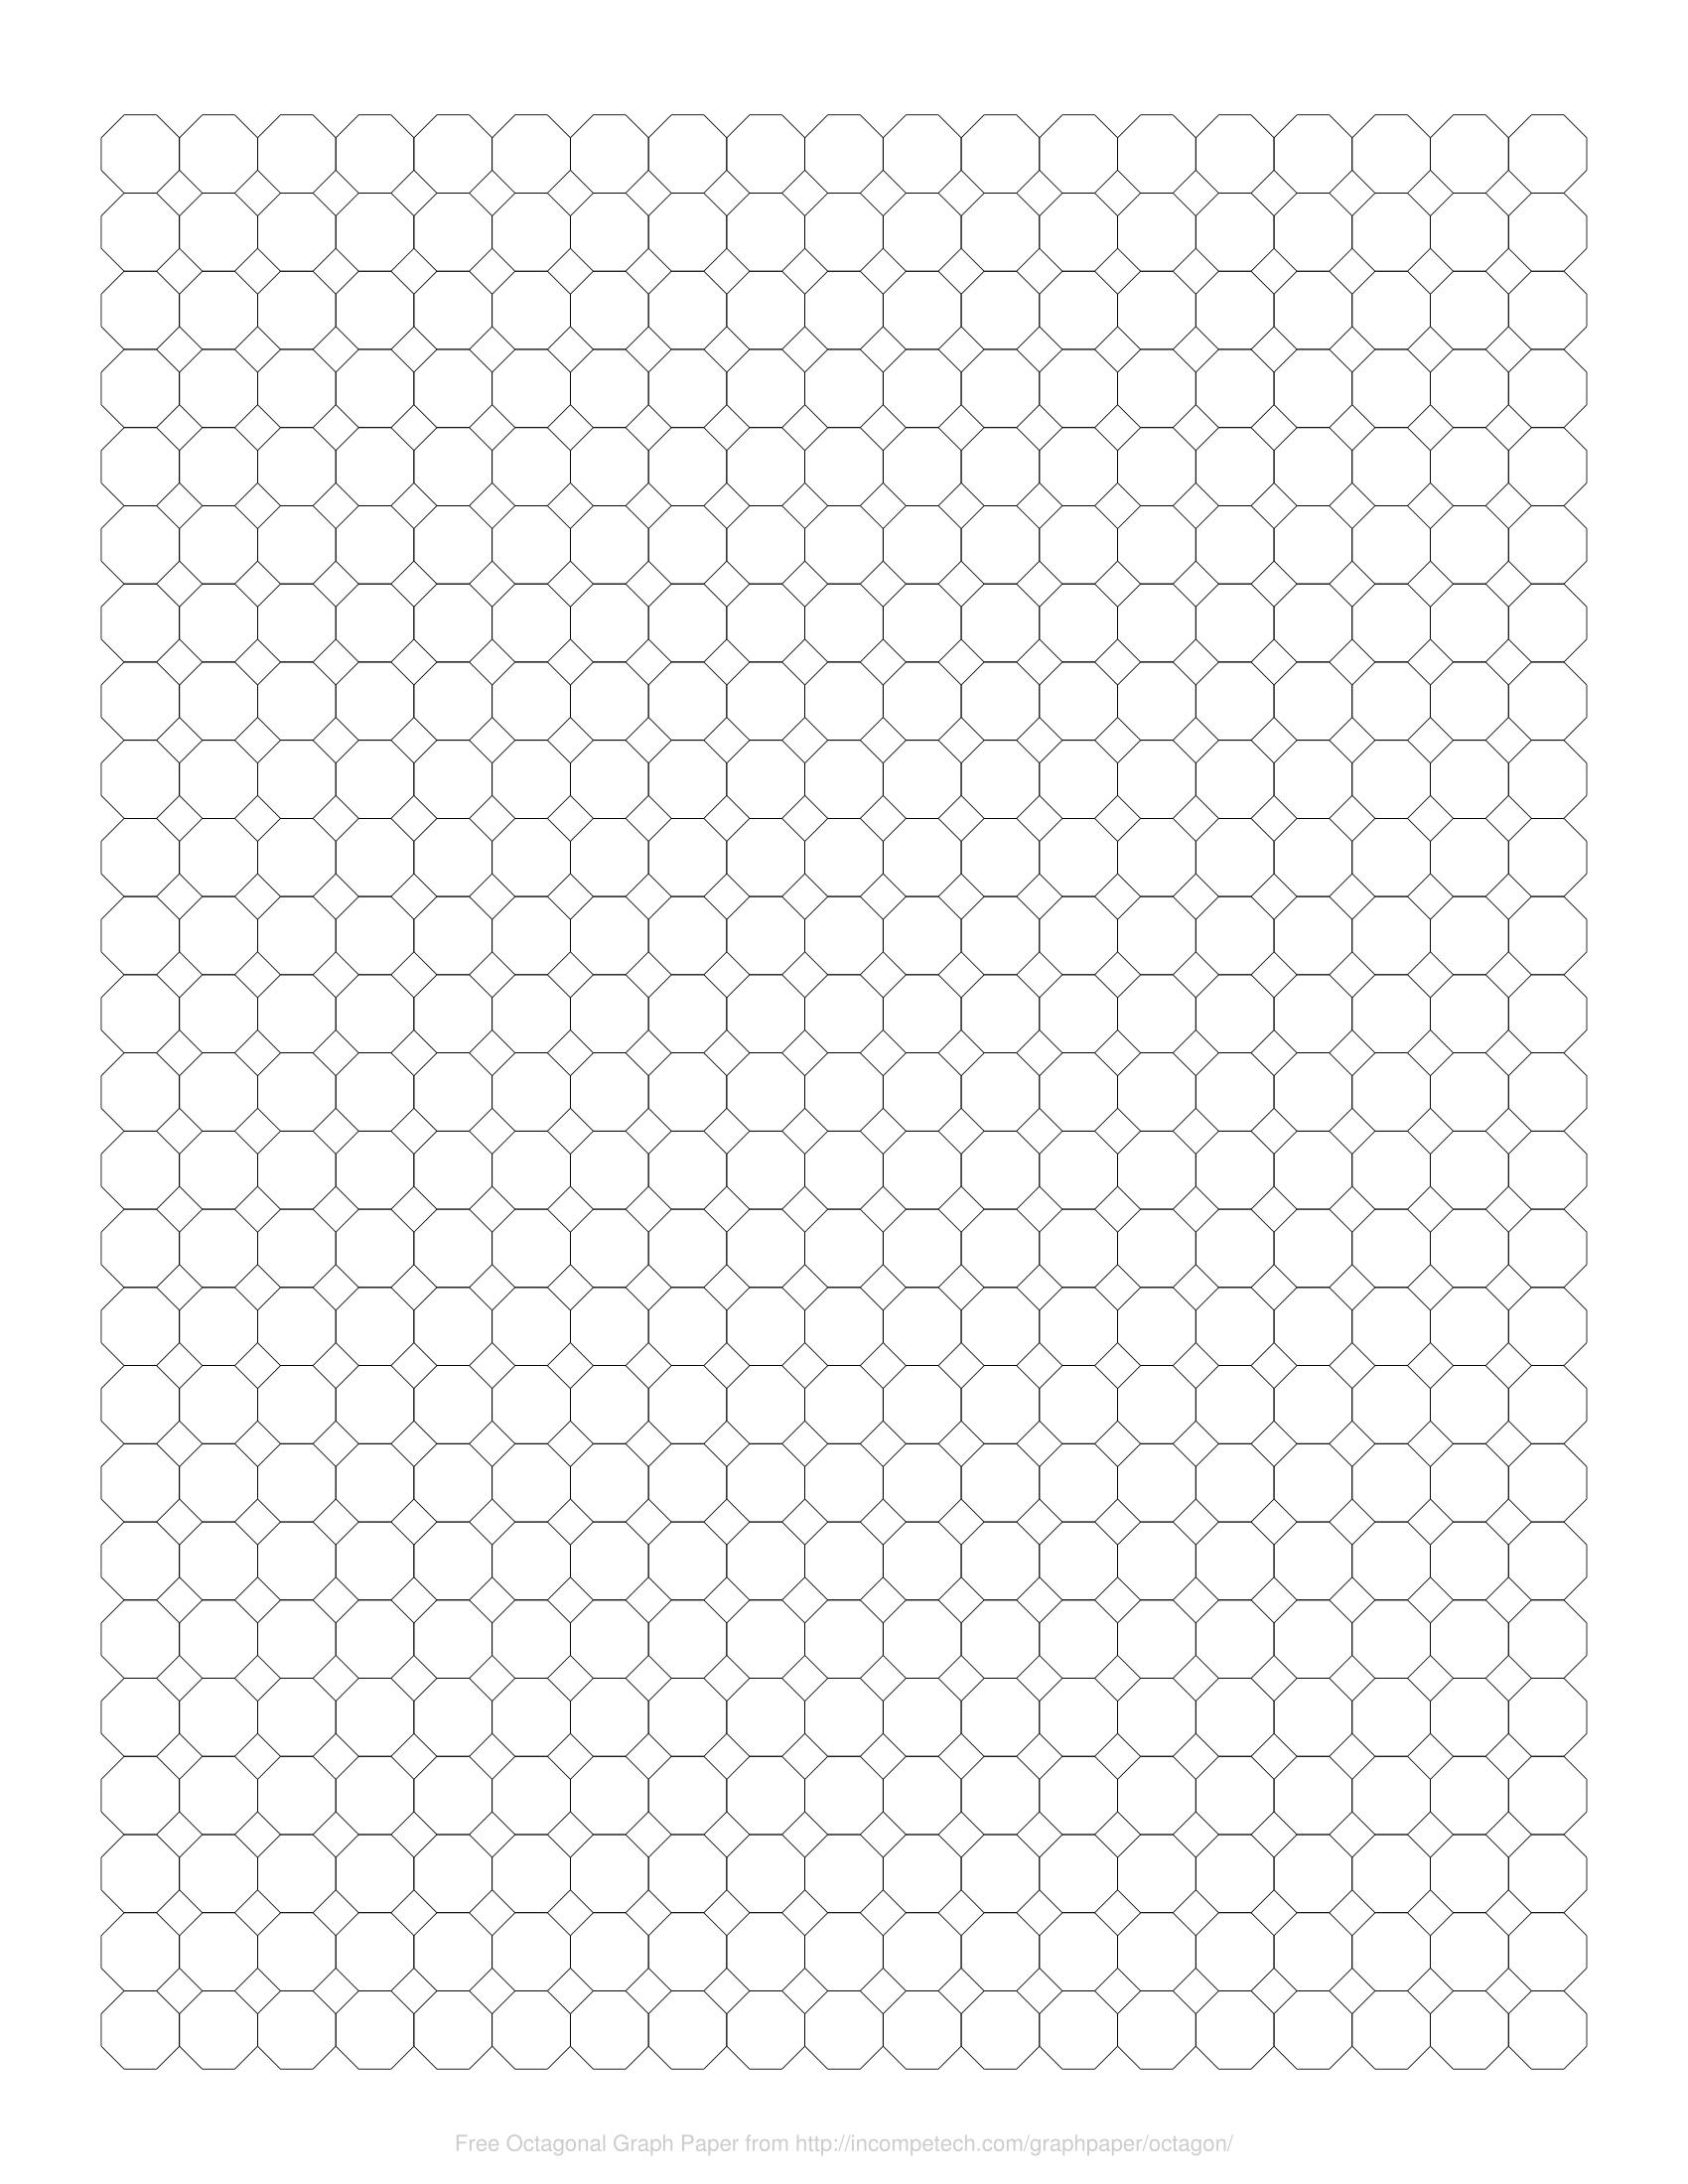 free online graph paper    octagonal